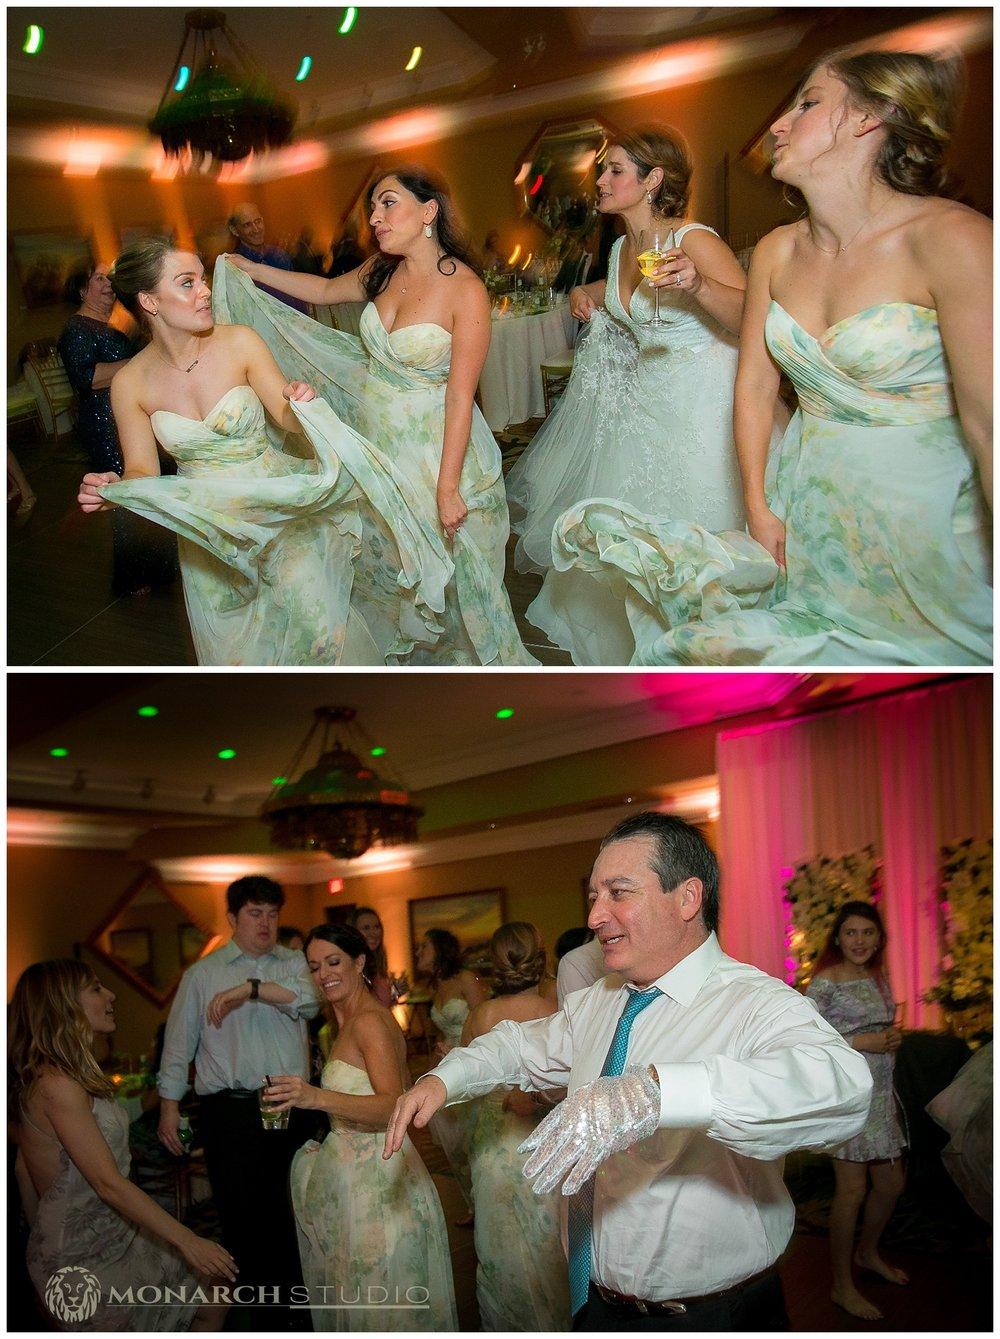 St. Augustine Wedding Photography 051.JPG